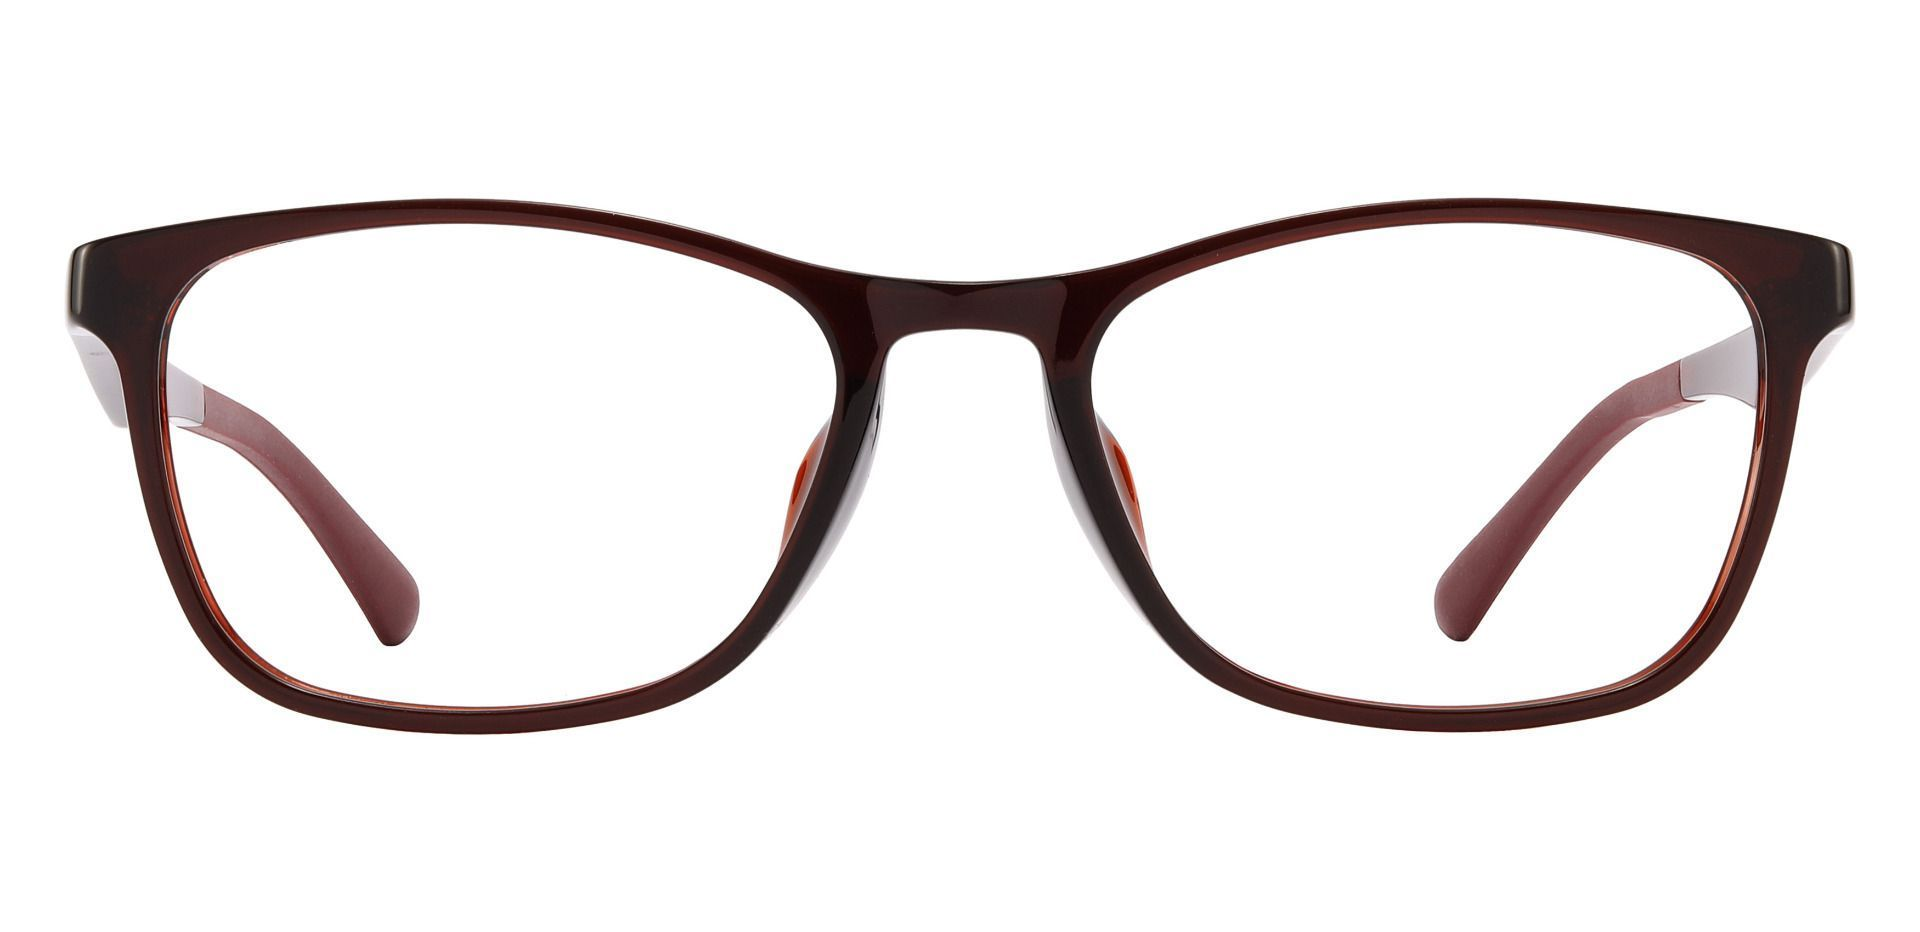 Latham Rectangle Prescription Glasses - Brown